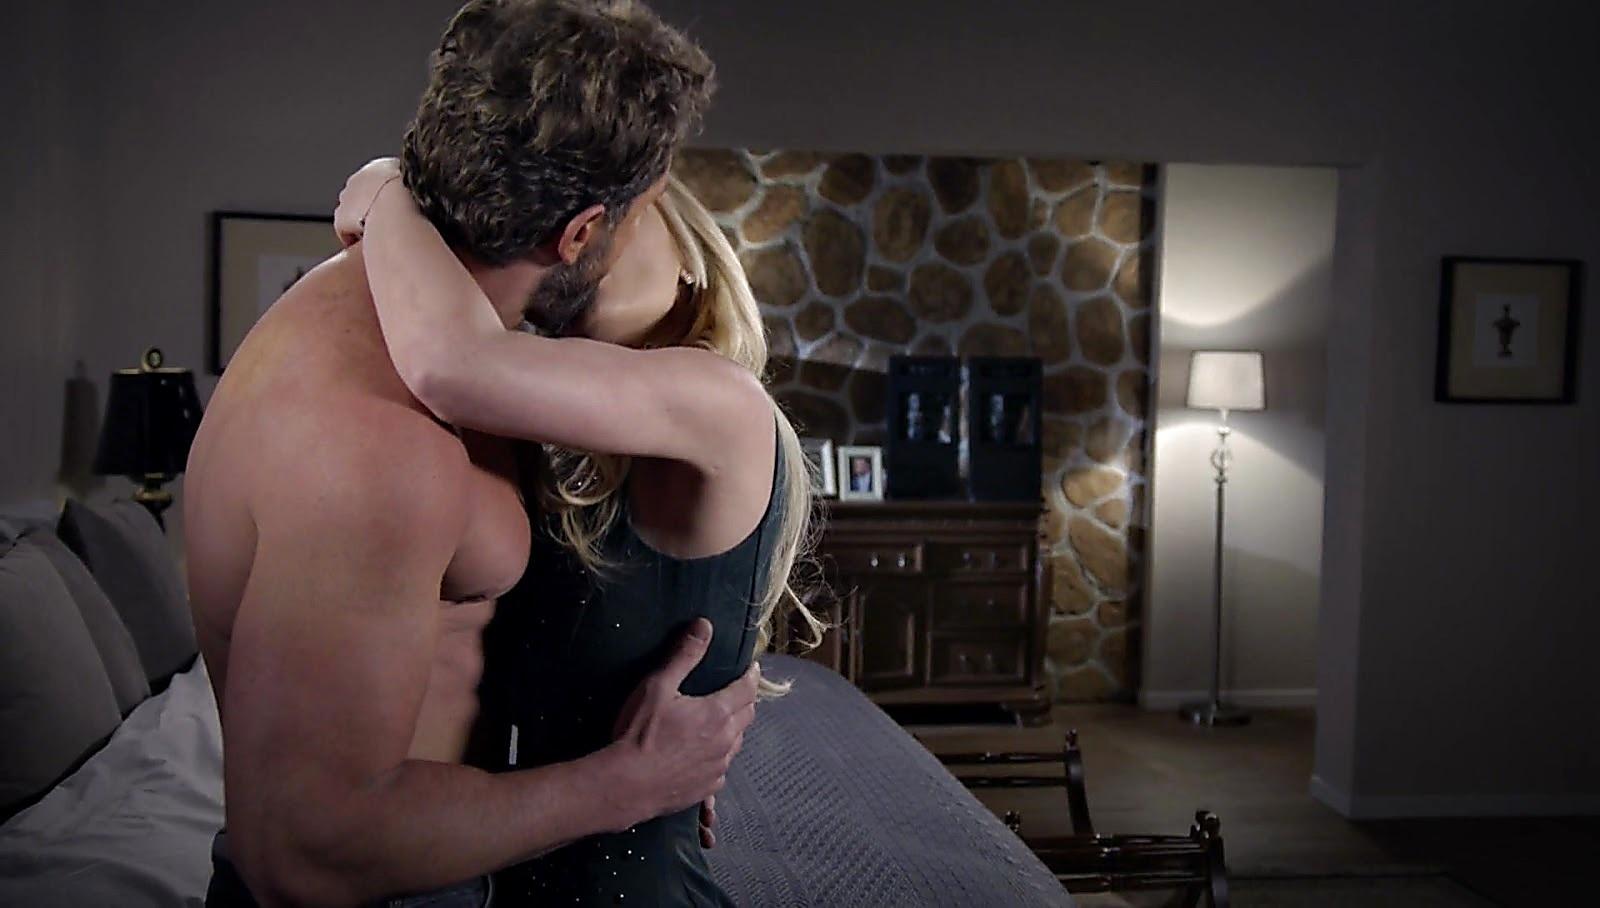 Gabriel Soto sexy shirtless scene April 27, 2017, 11am